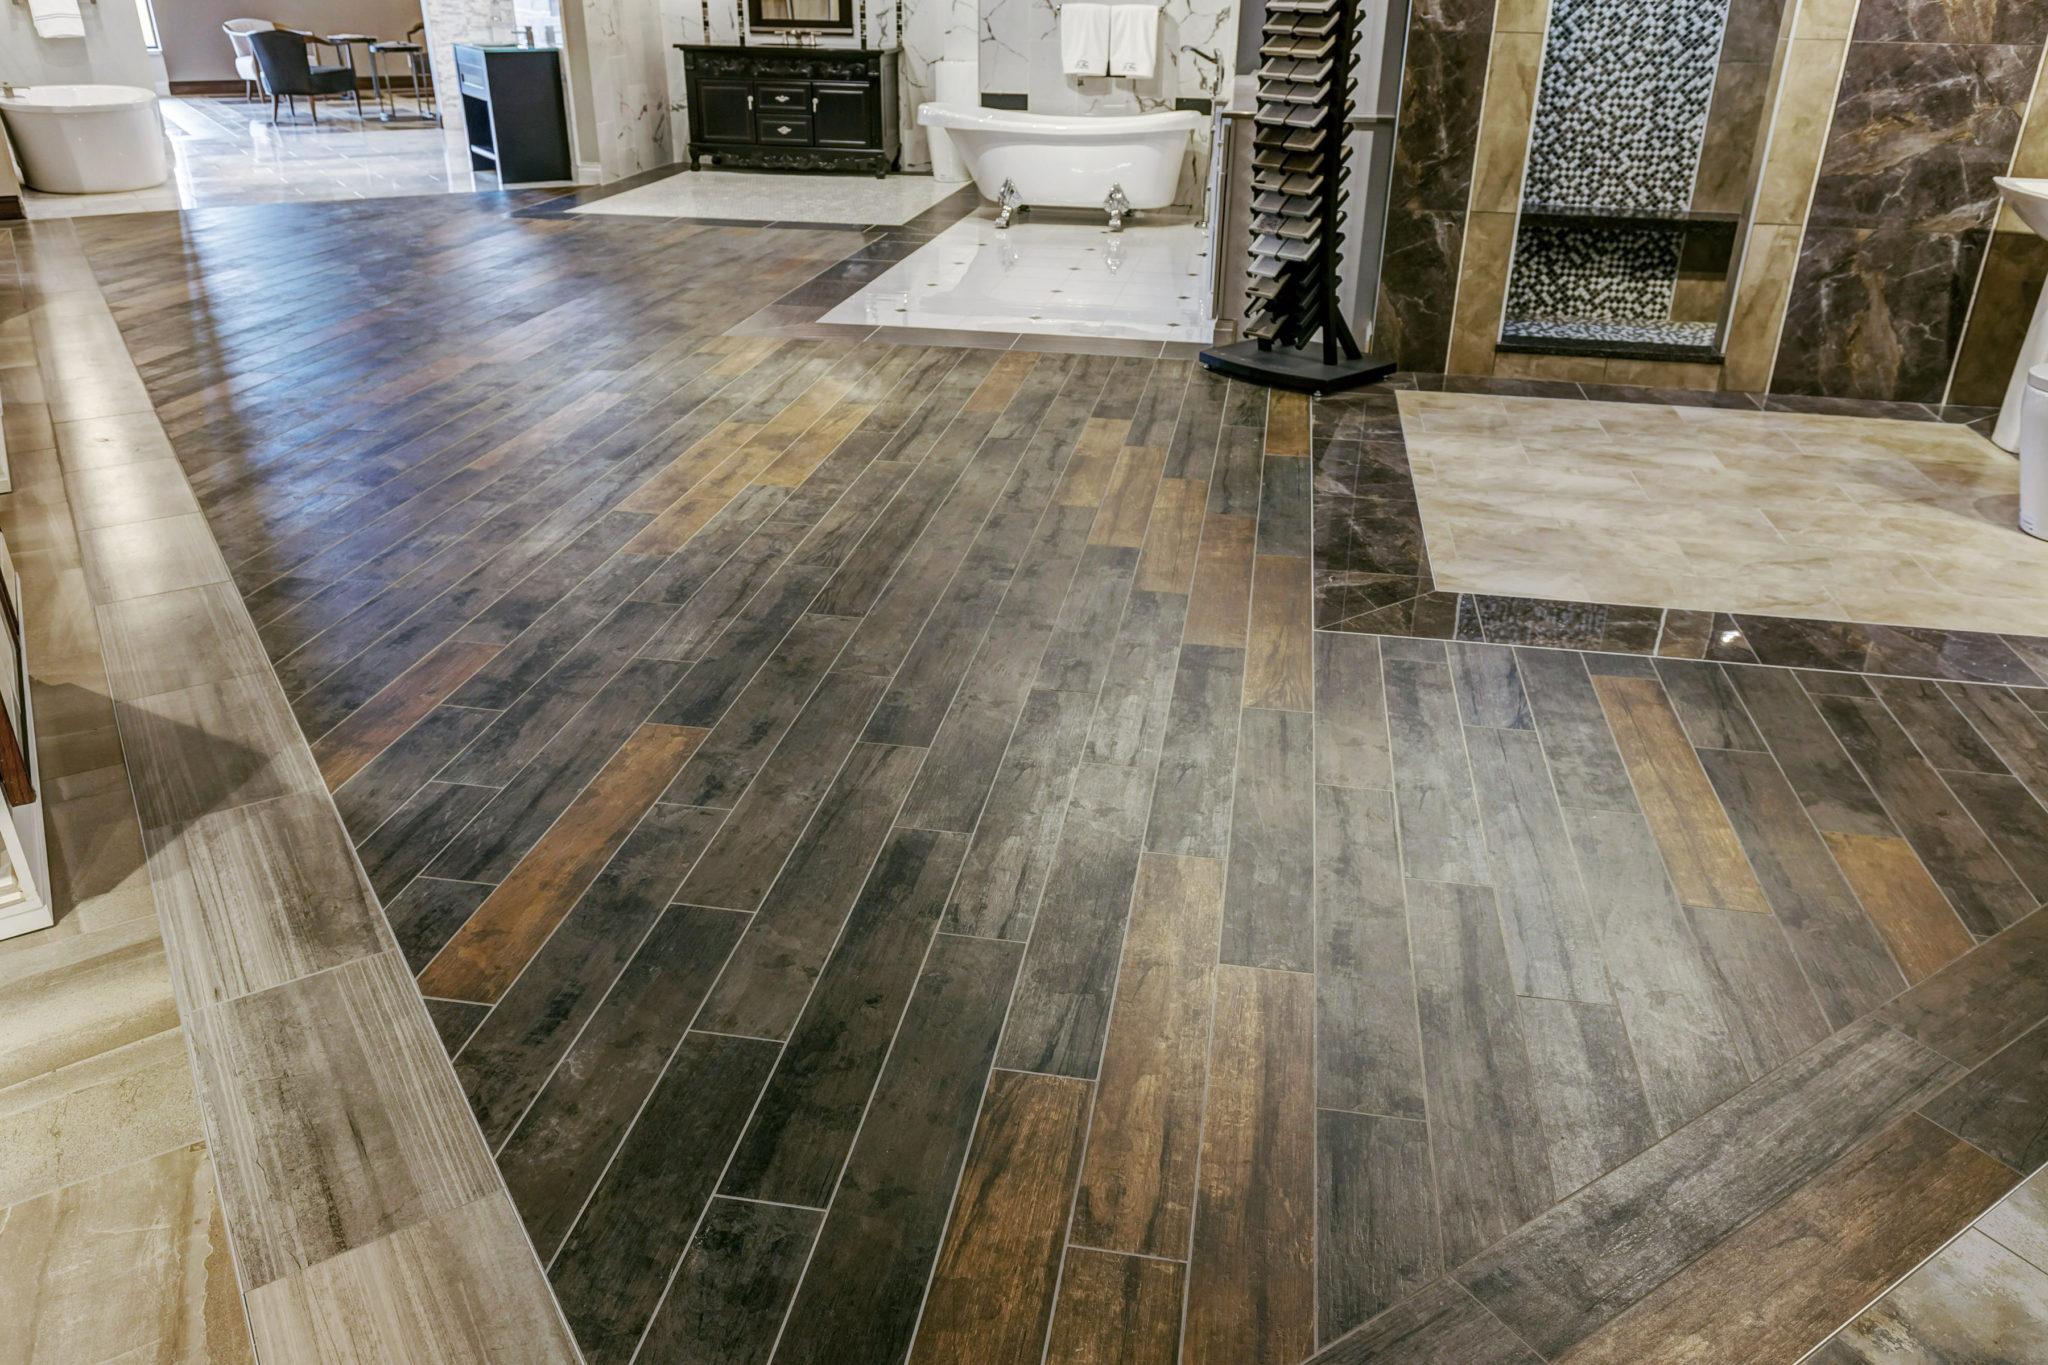 Hardwood laminate carpet showroom eureka 63025 st louis tile floor tile dailygadgetfo Images